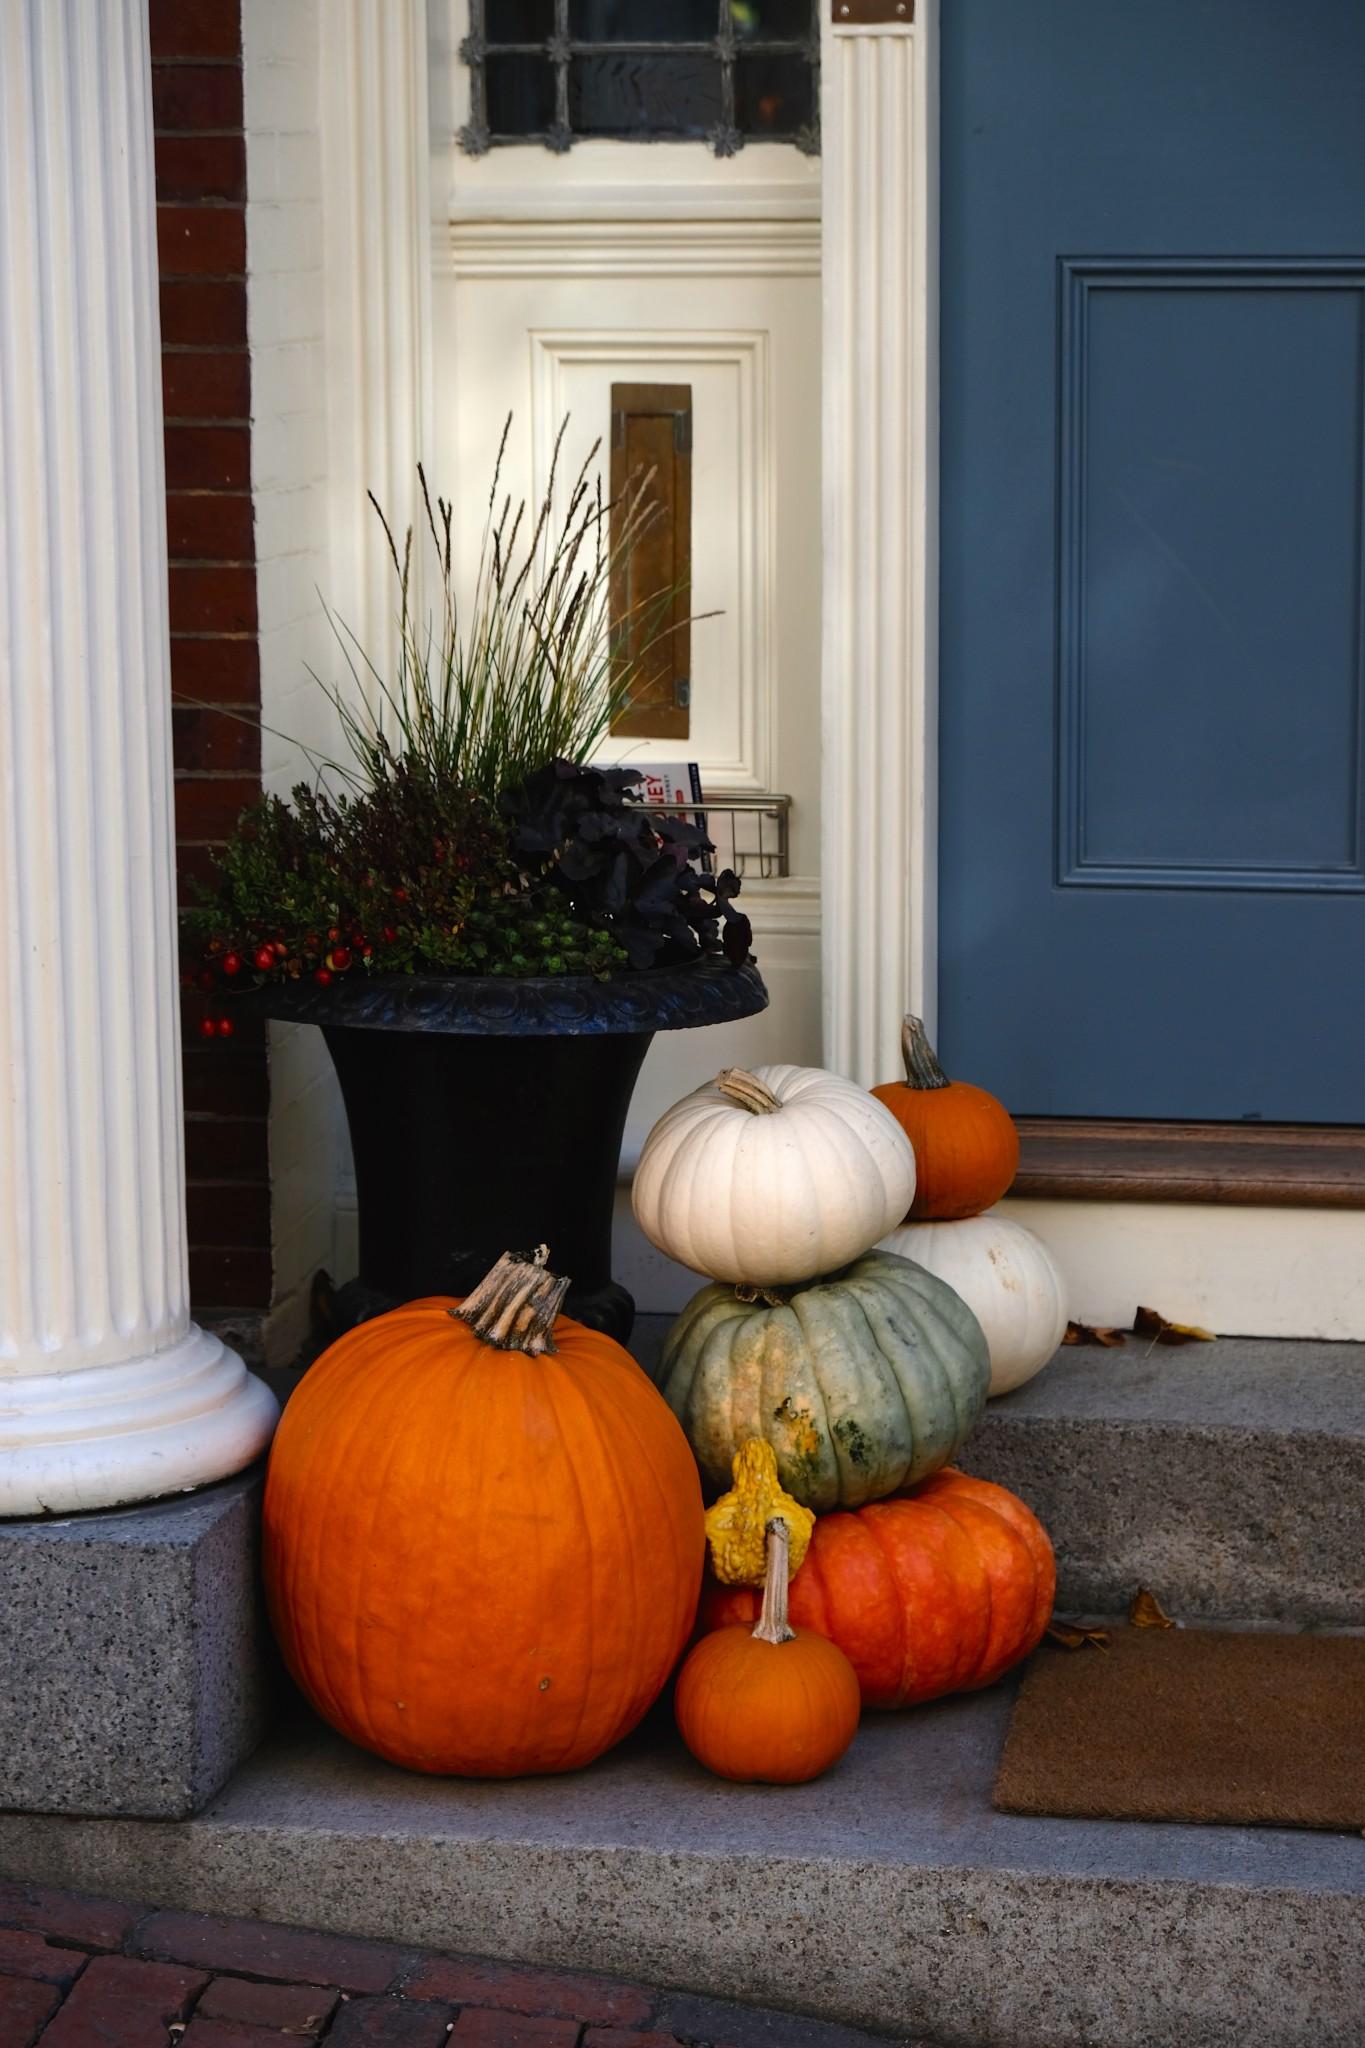 pumpkins on stoop, the-alyst.com